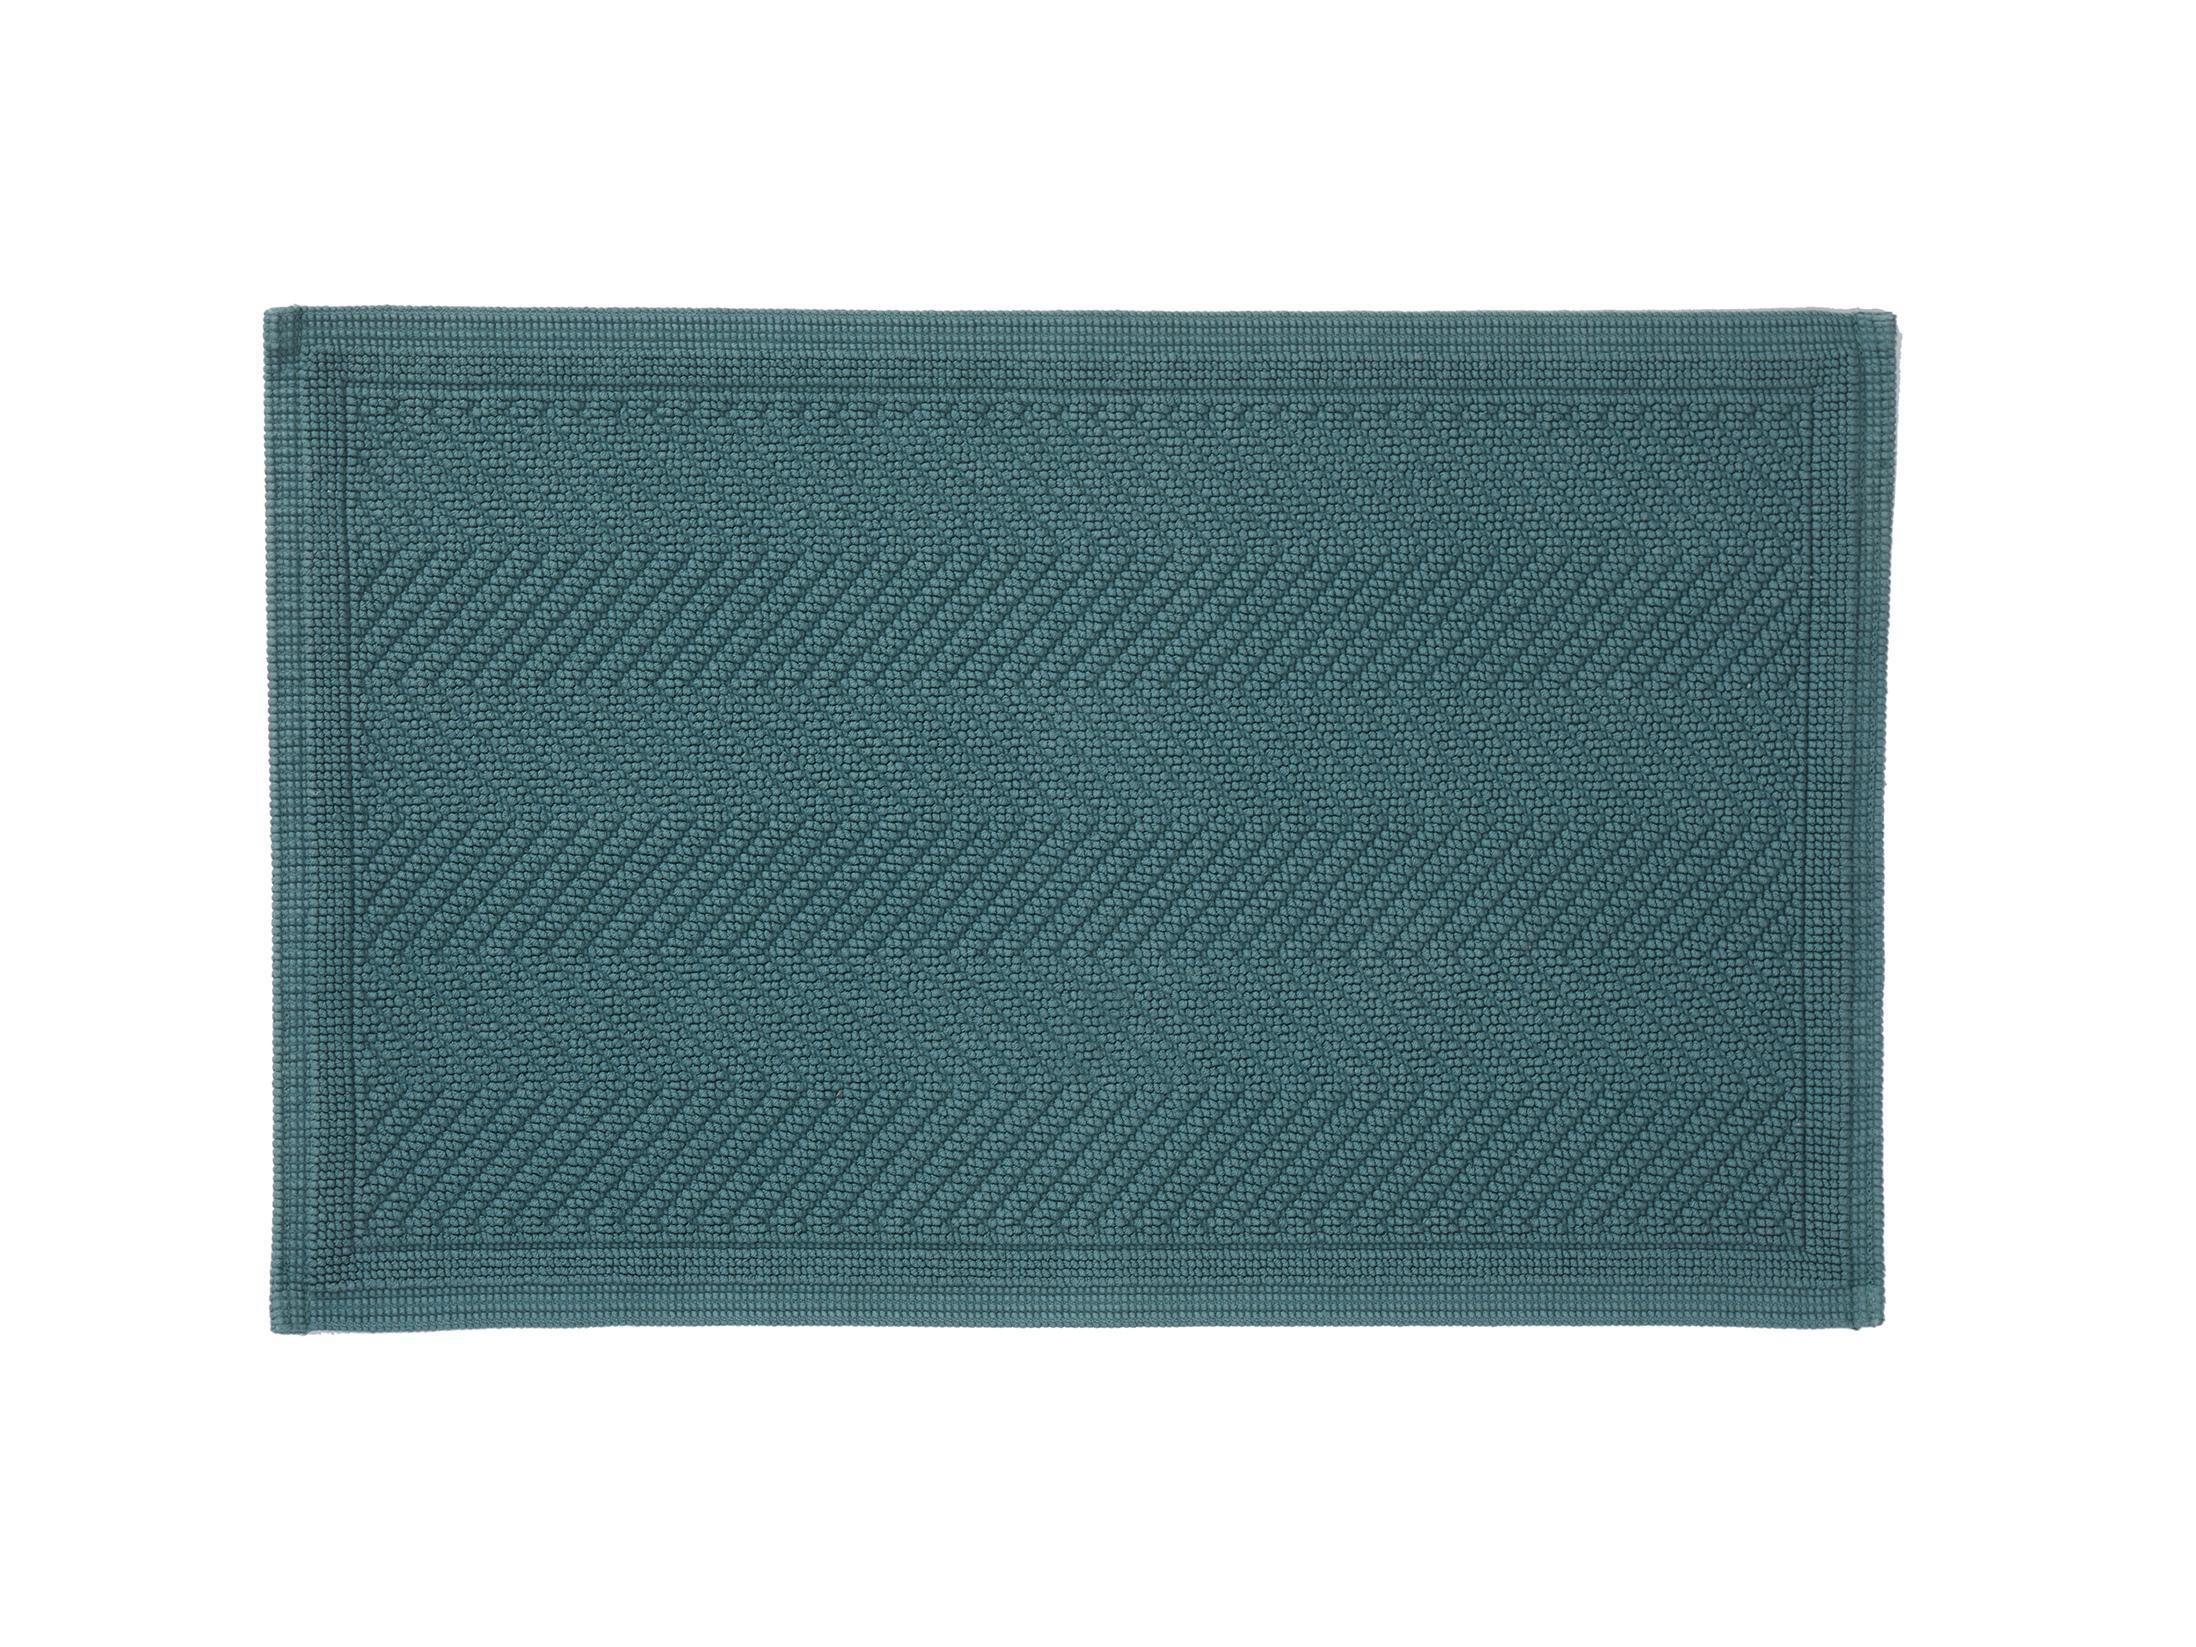 Black Color Nova Home Collection Non-Slip Safety Water Absorbent Soft 3 Pieces Plush Bath Mat Floor Mat Set